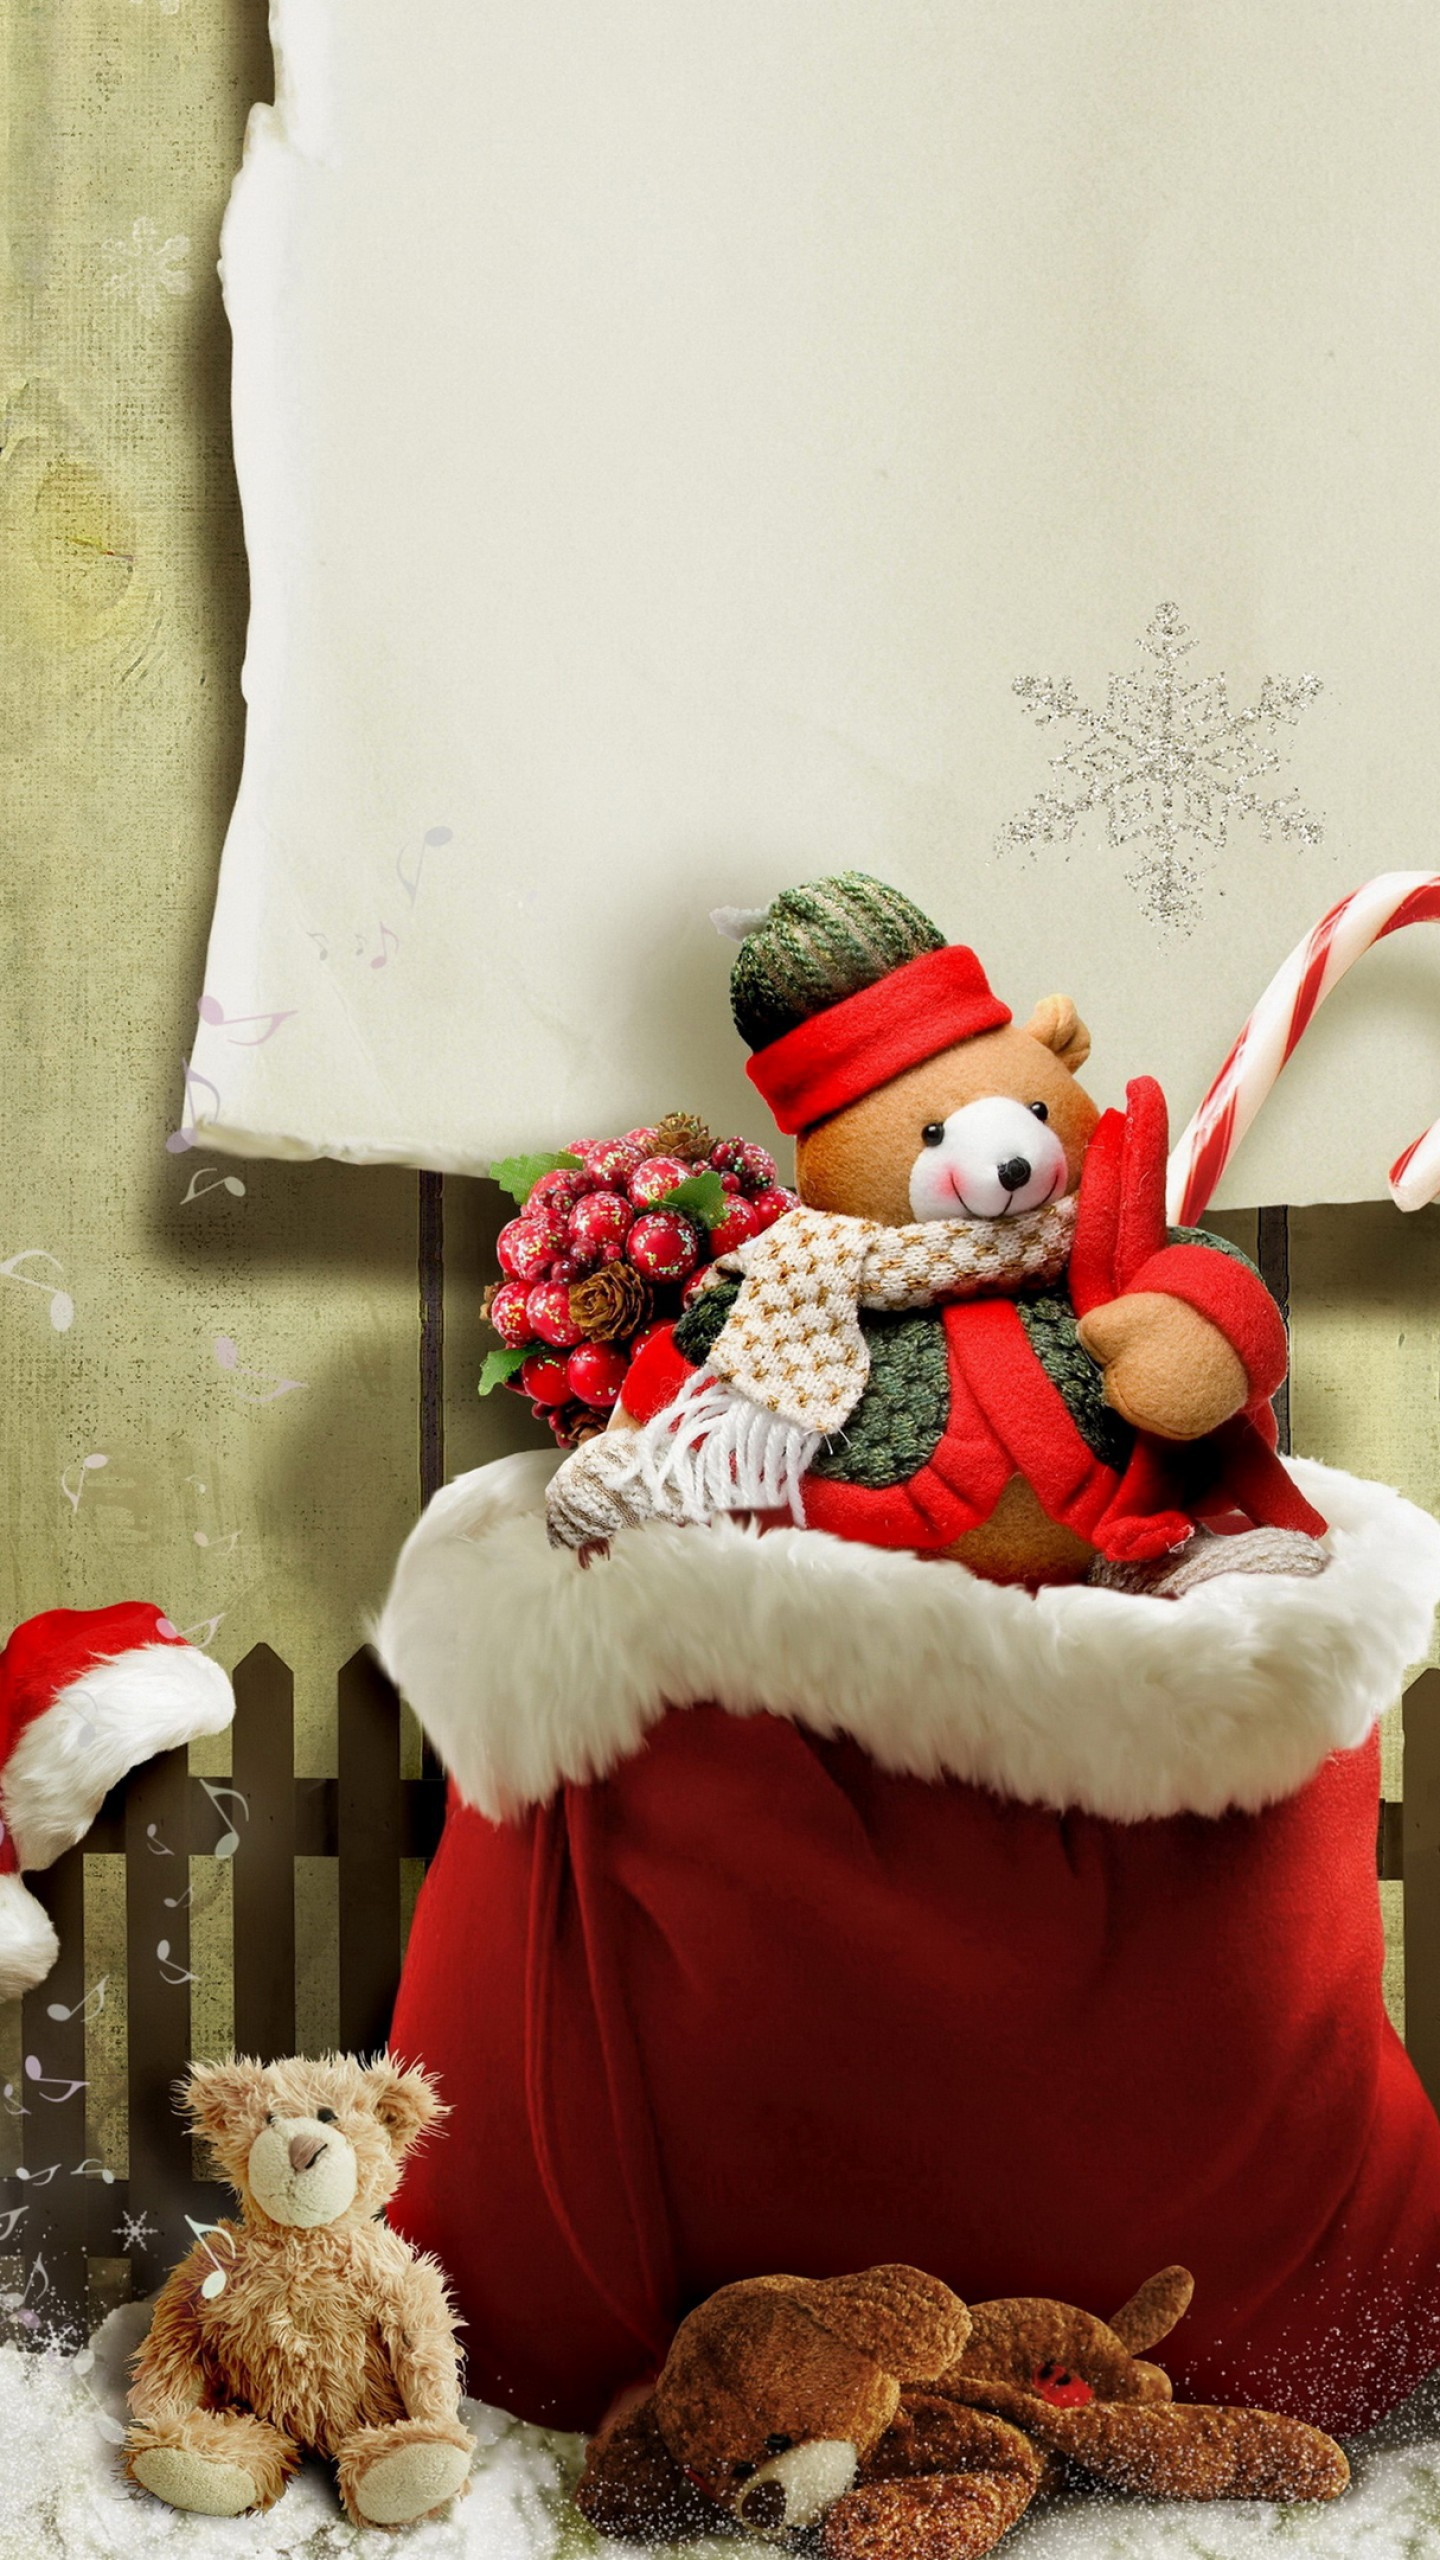 عکس زمینه خرس برفی هدیه کریسمس پس زمینه